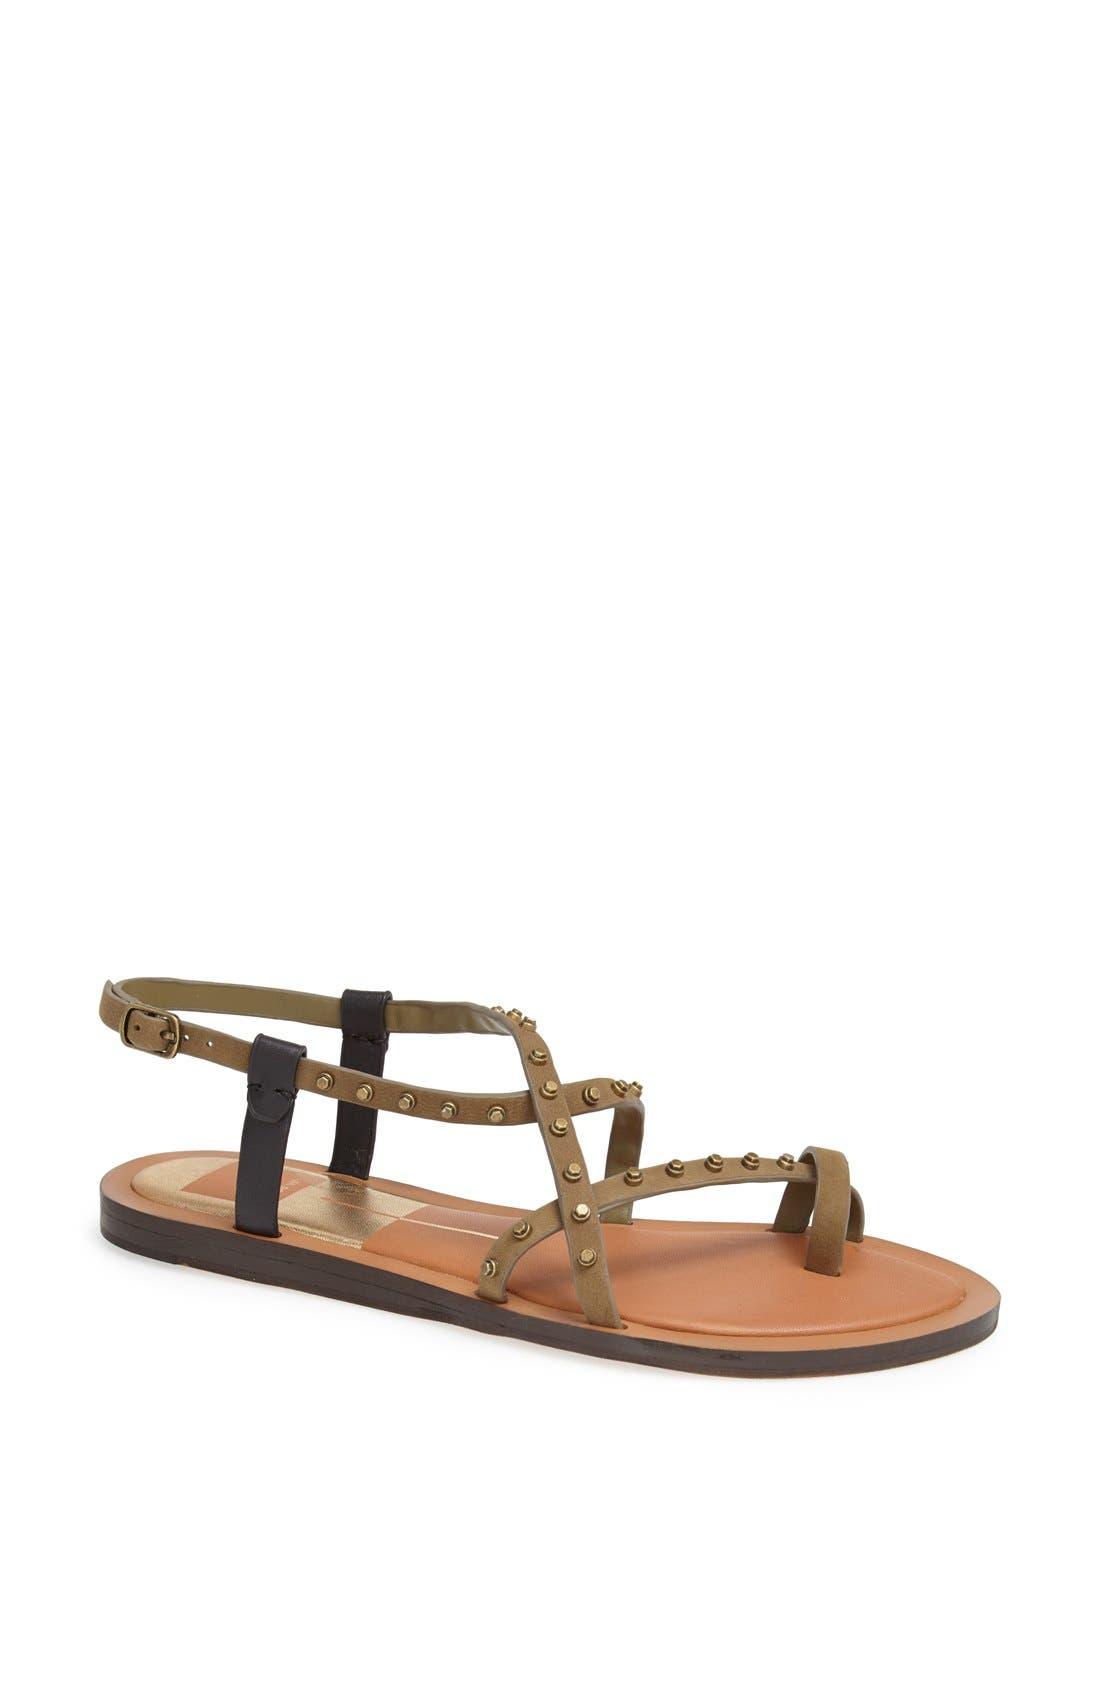 Alternate Image 1 Selected - Dolce Vita 'Flame' Studded Leather Sandal